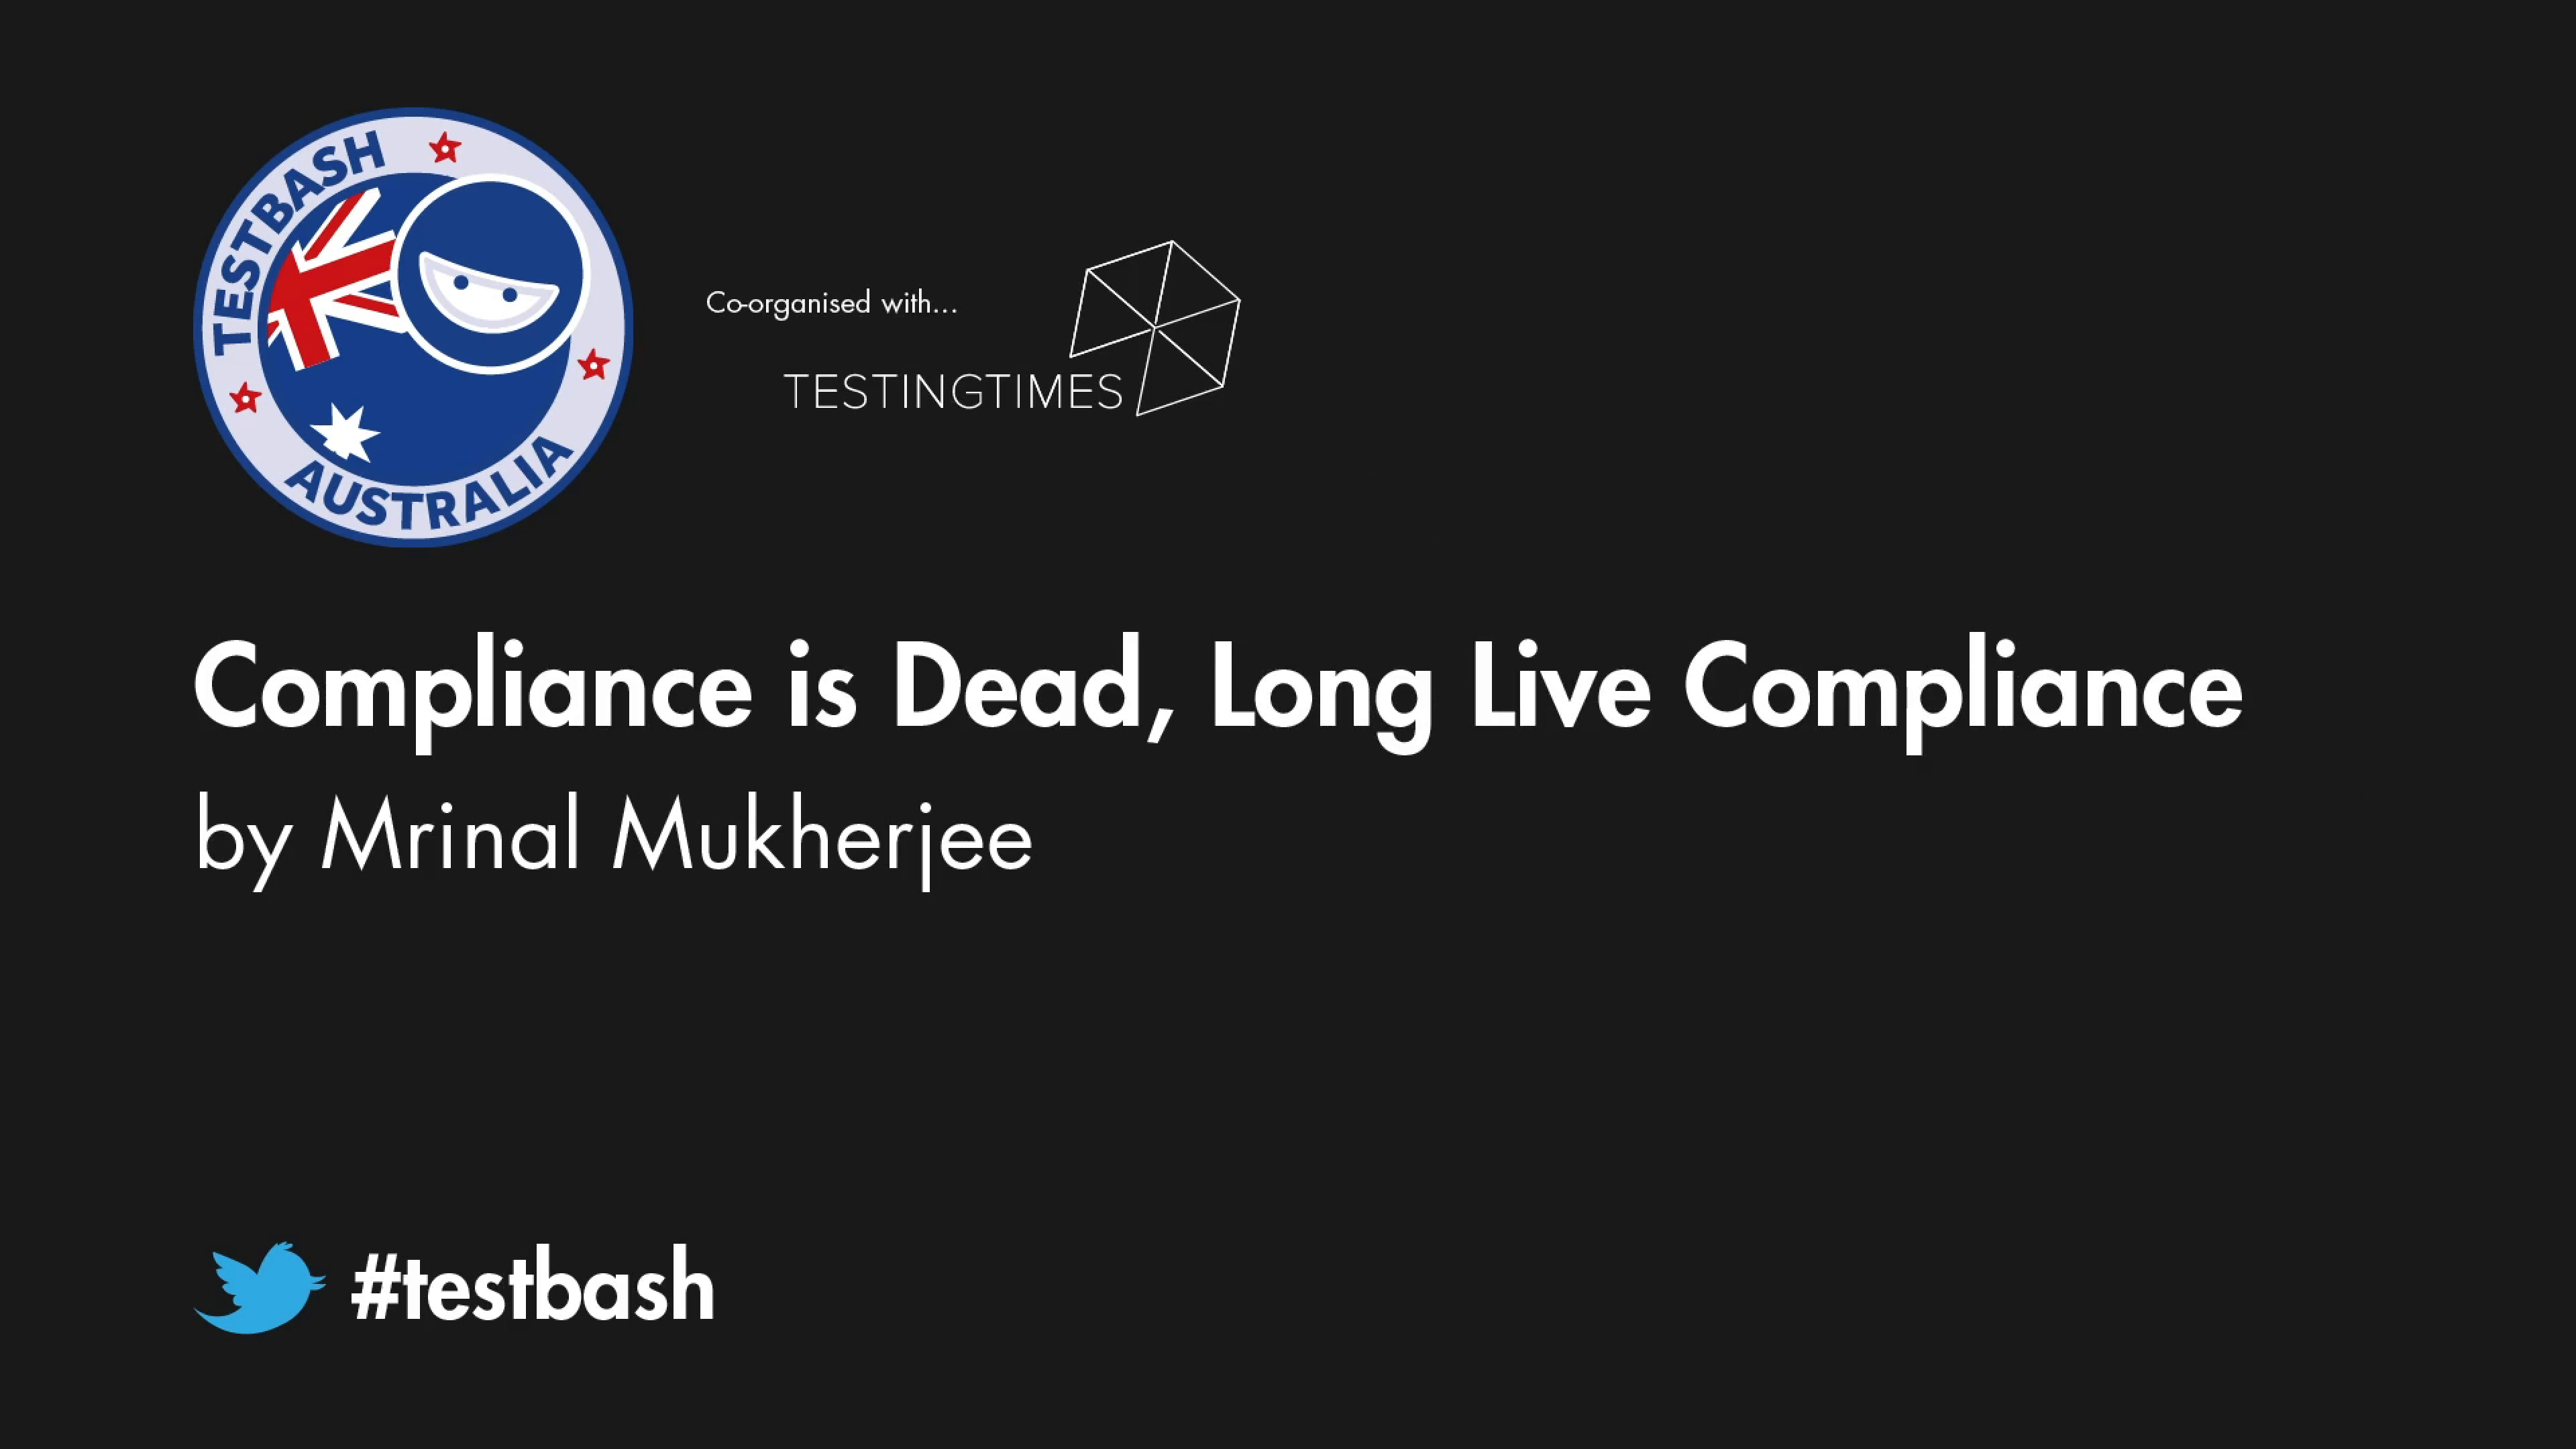 Compliance is Dead, Long Live Compliance - Mrinal Mukherjee